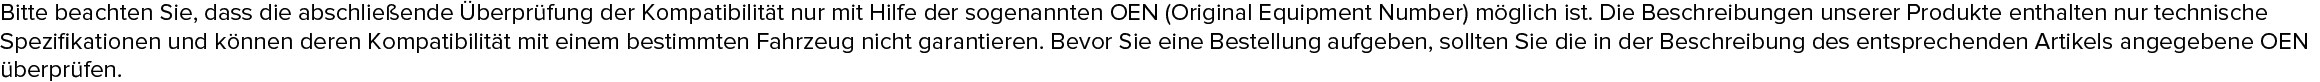 ATE 1K0 698 451 G, 3AA 698 451, 3C0 698 451 D, 3C0 698 451 E, 3C0 698 451 F Bremsbelagsatz, Scheibenbremse